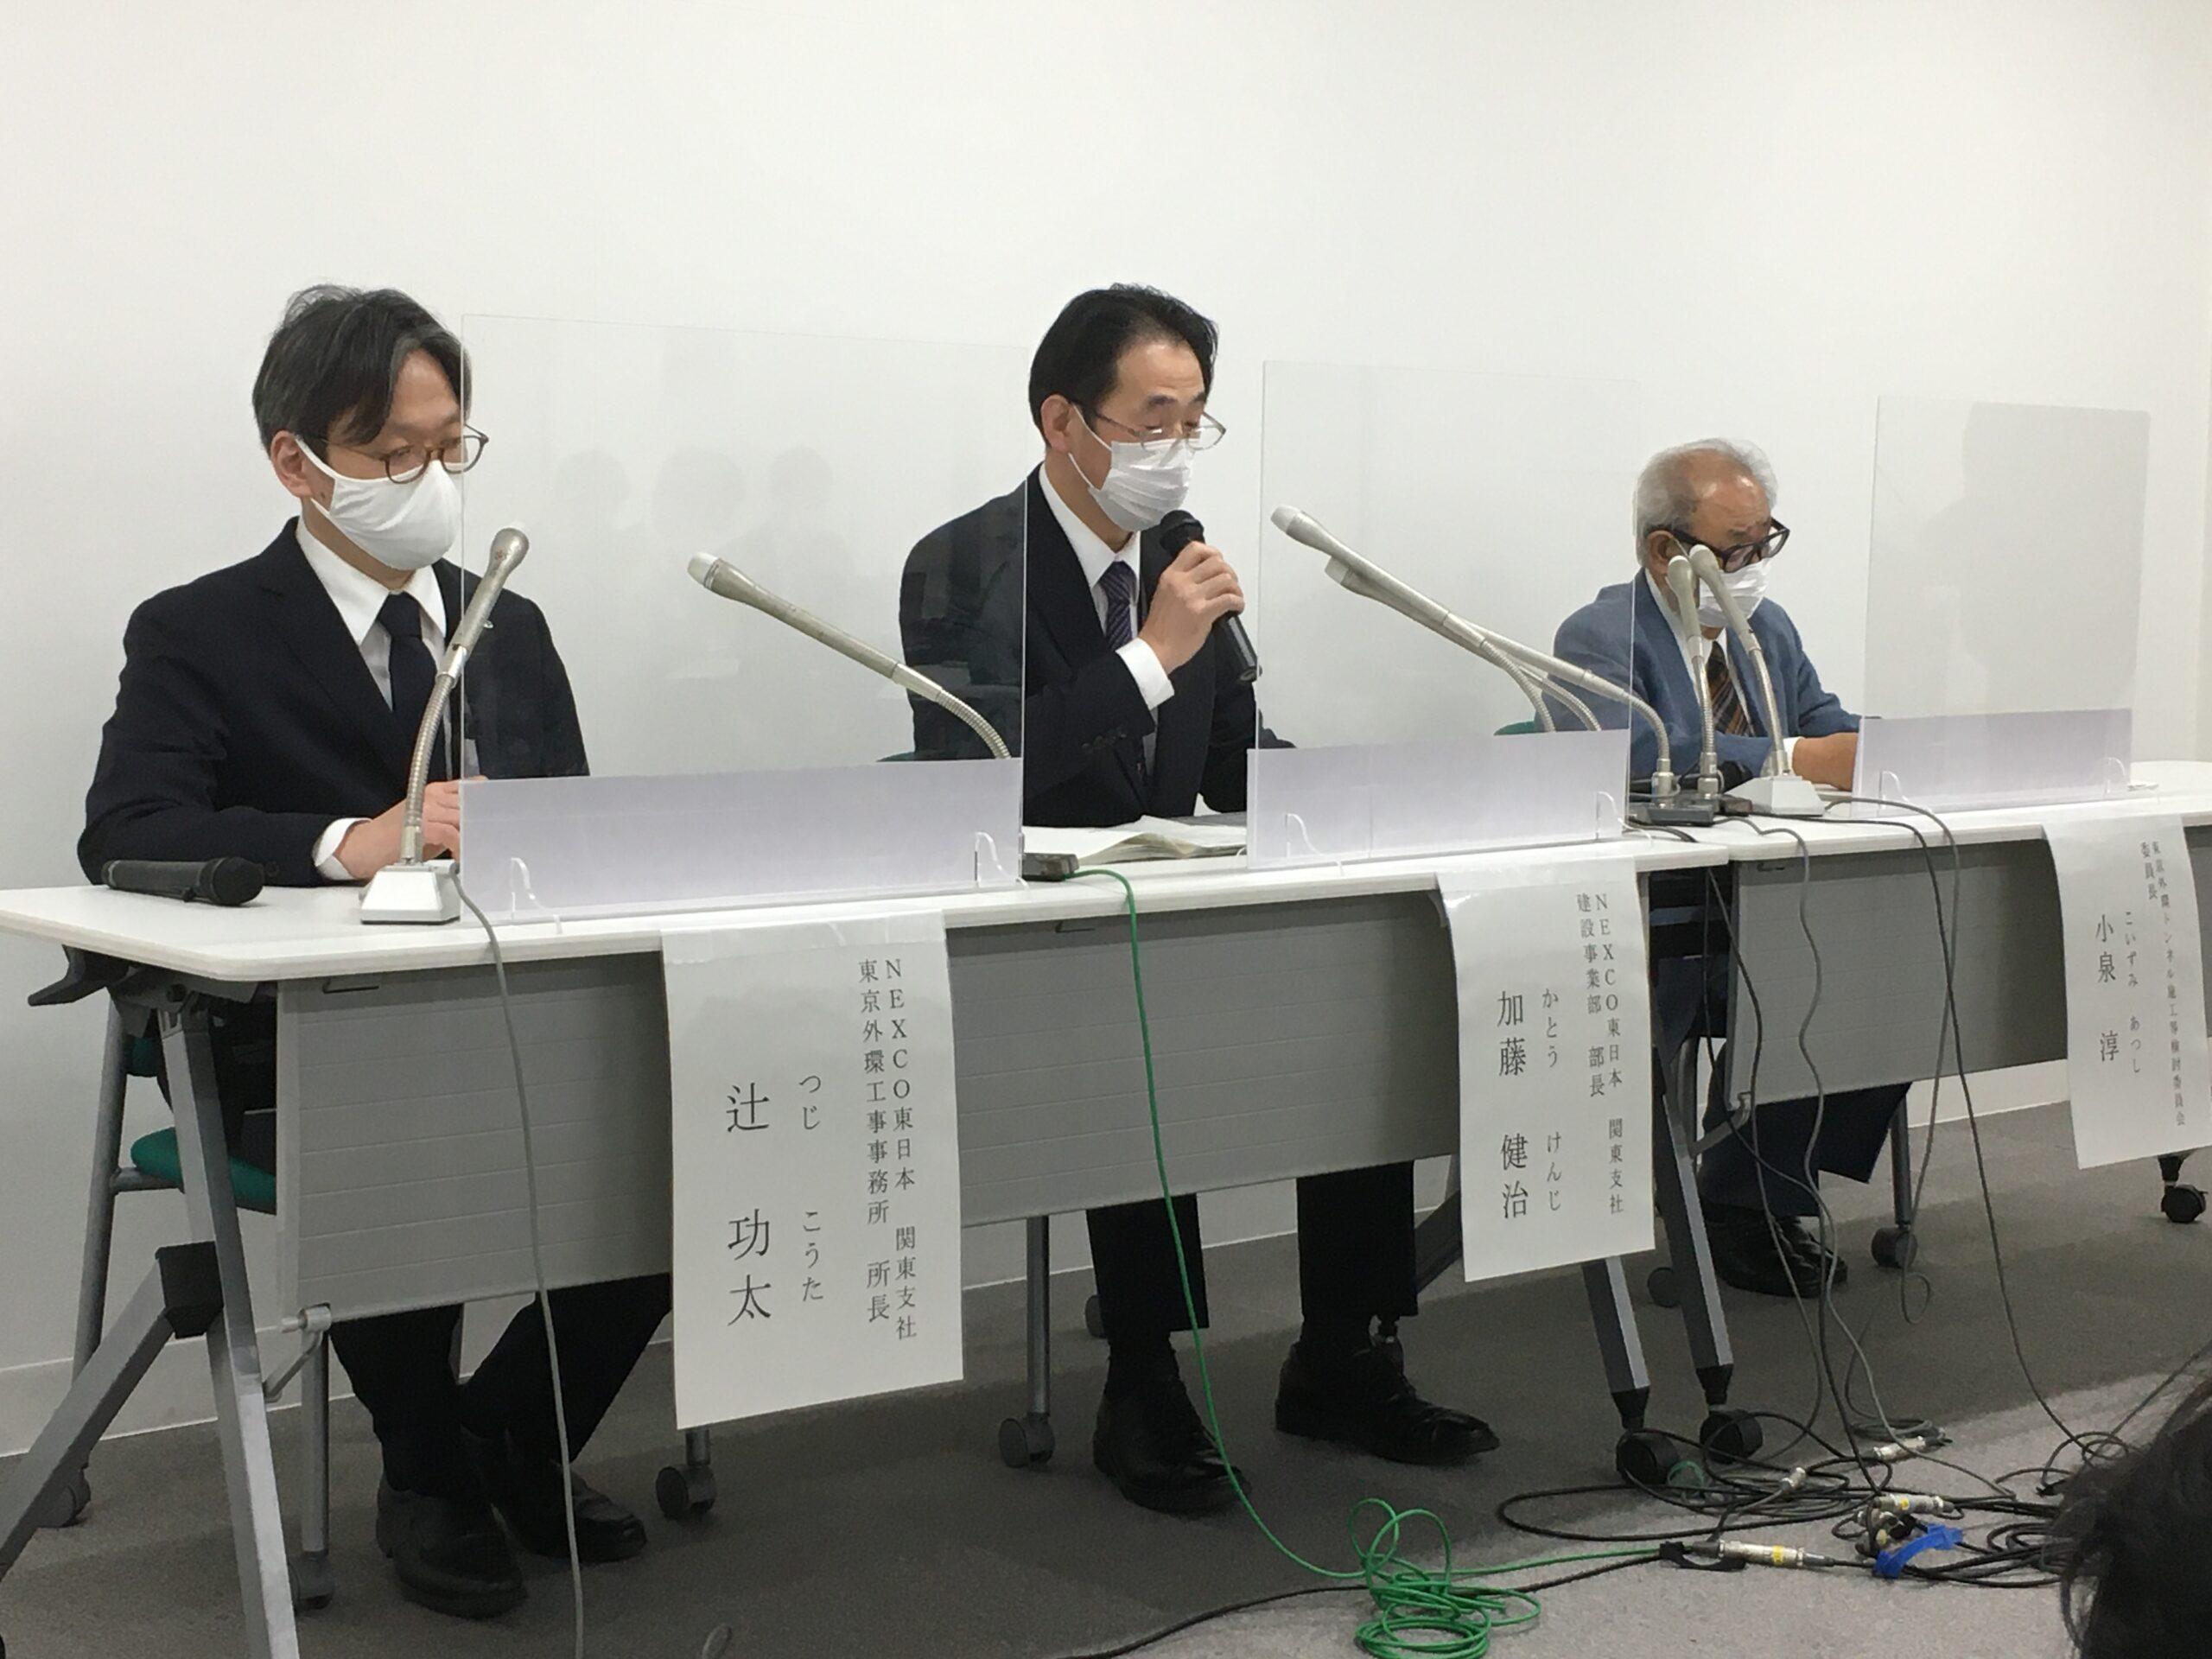 調布道路陥没、補償対象地域1000件への補償方針を明確化ーNEXCO東日本